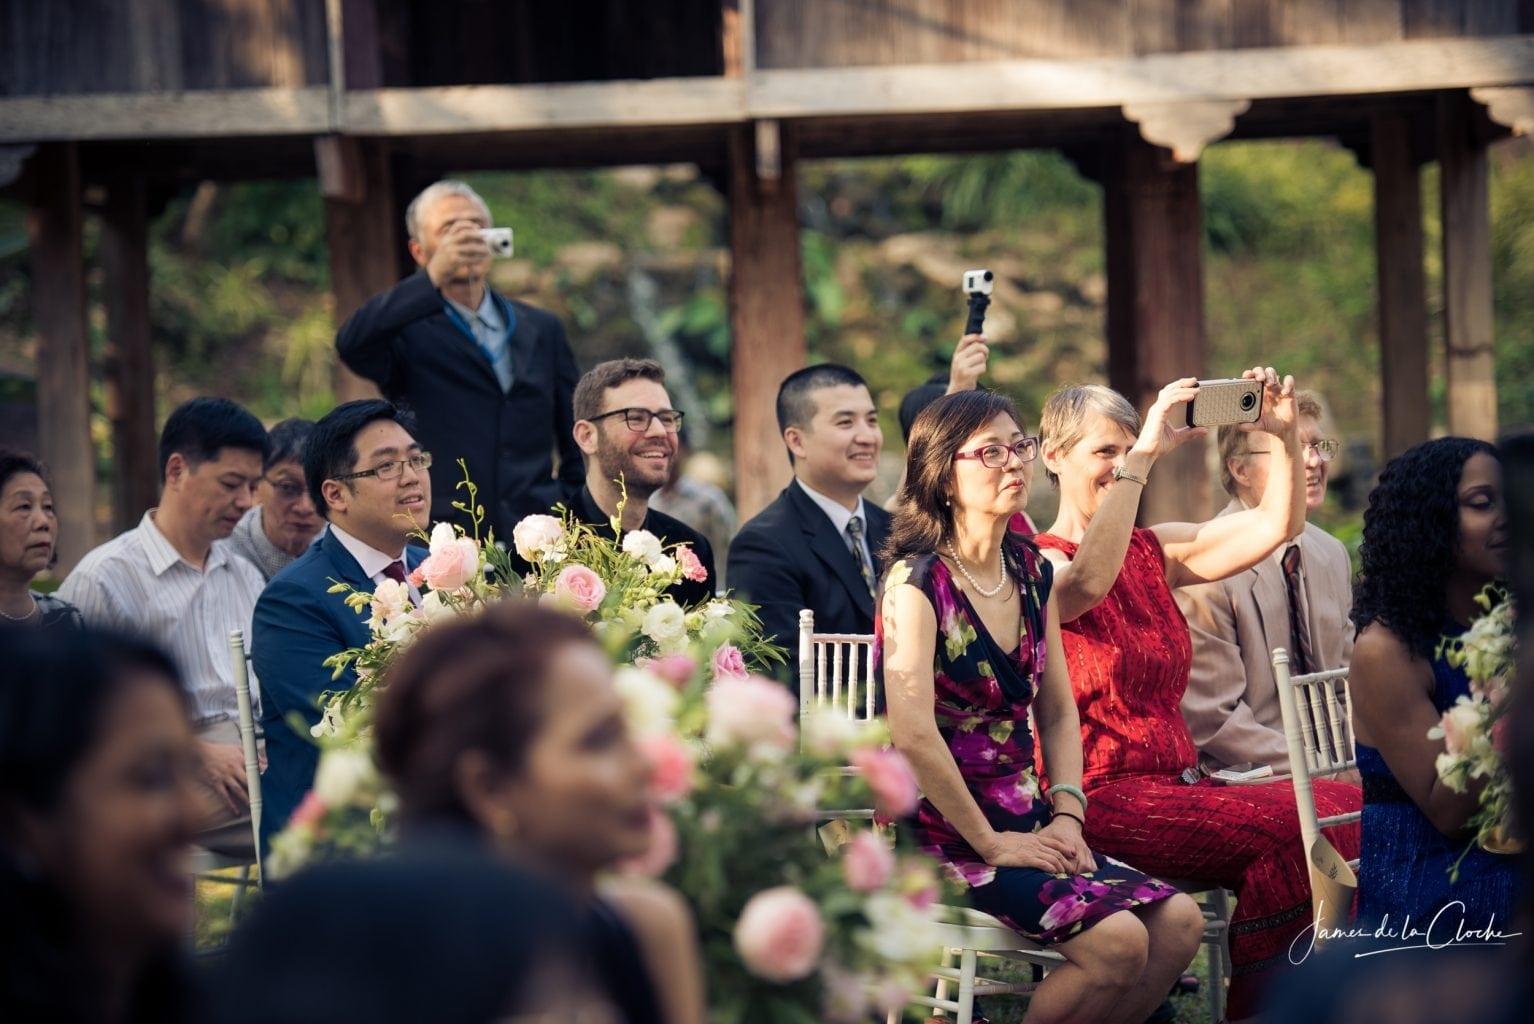 Wedding Guests Look On